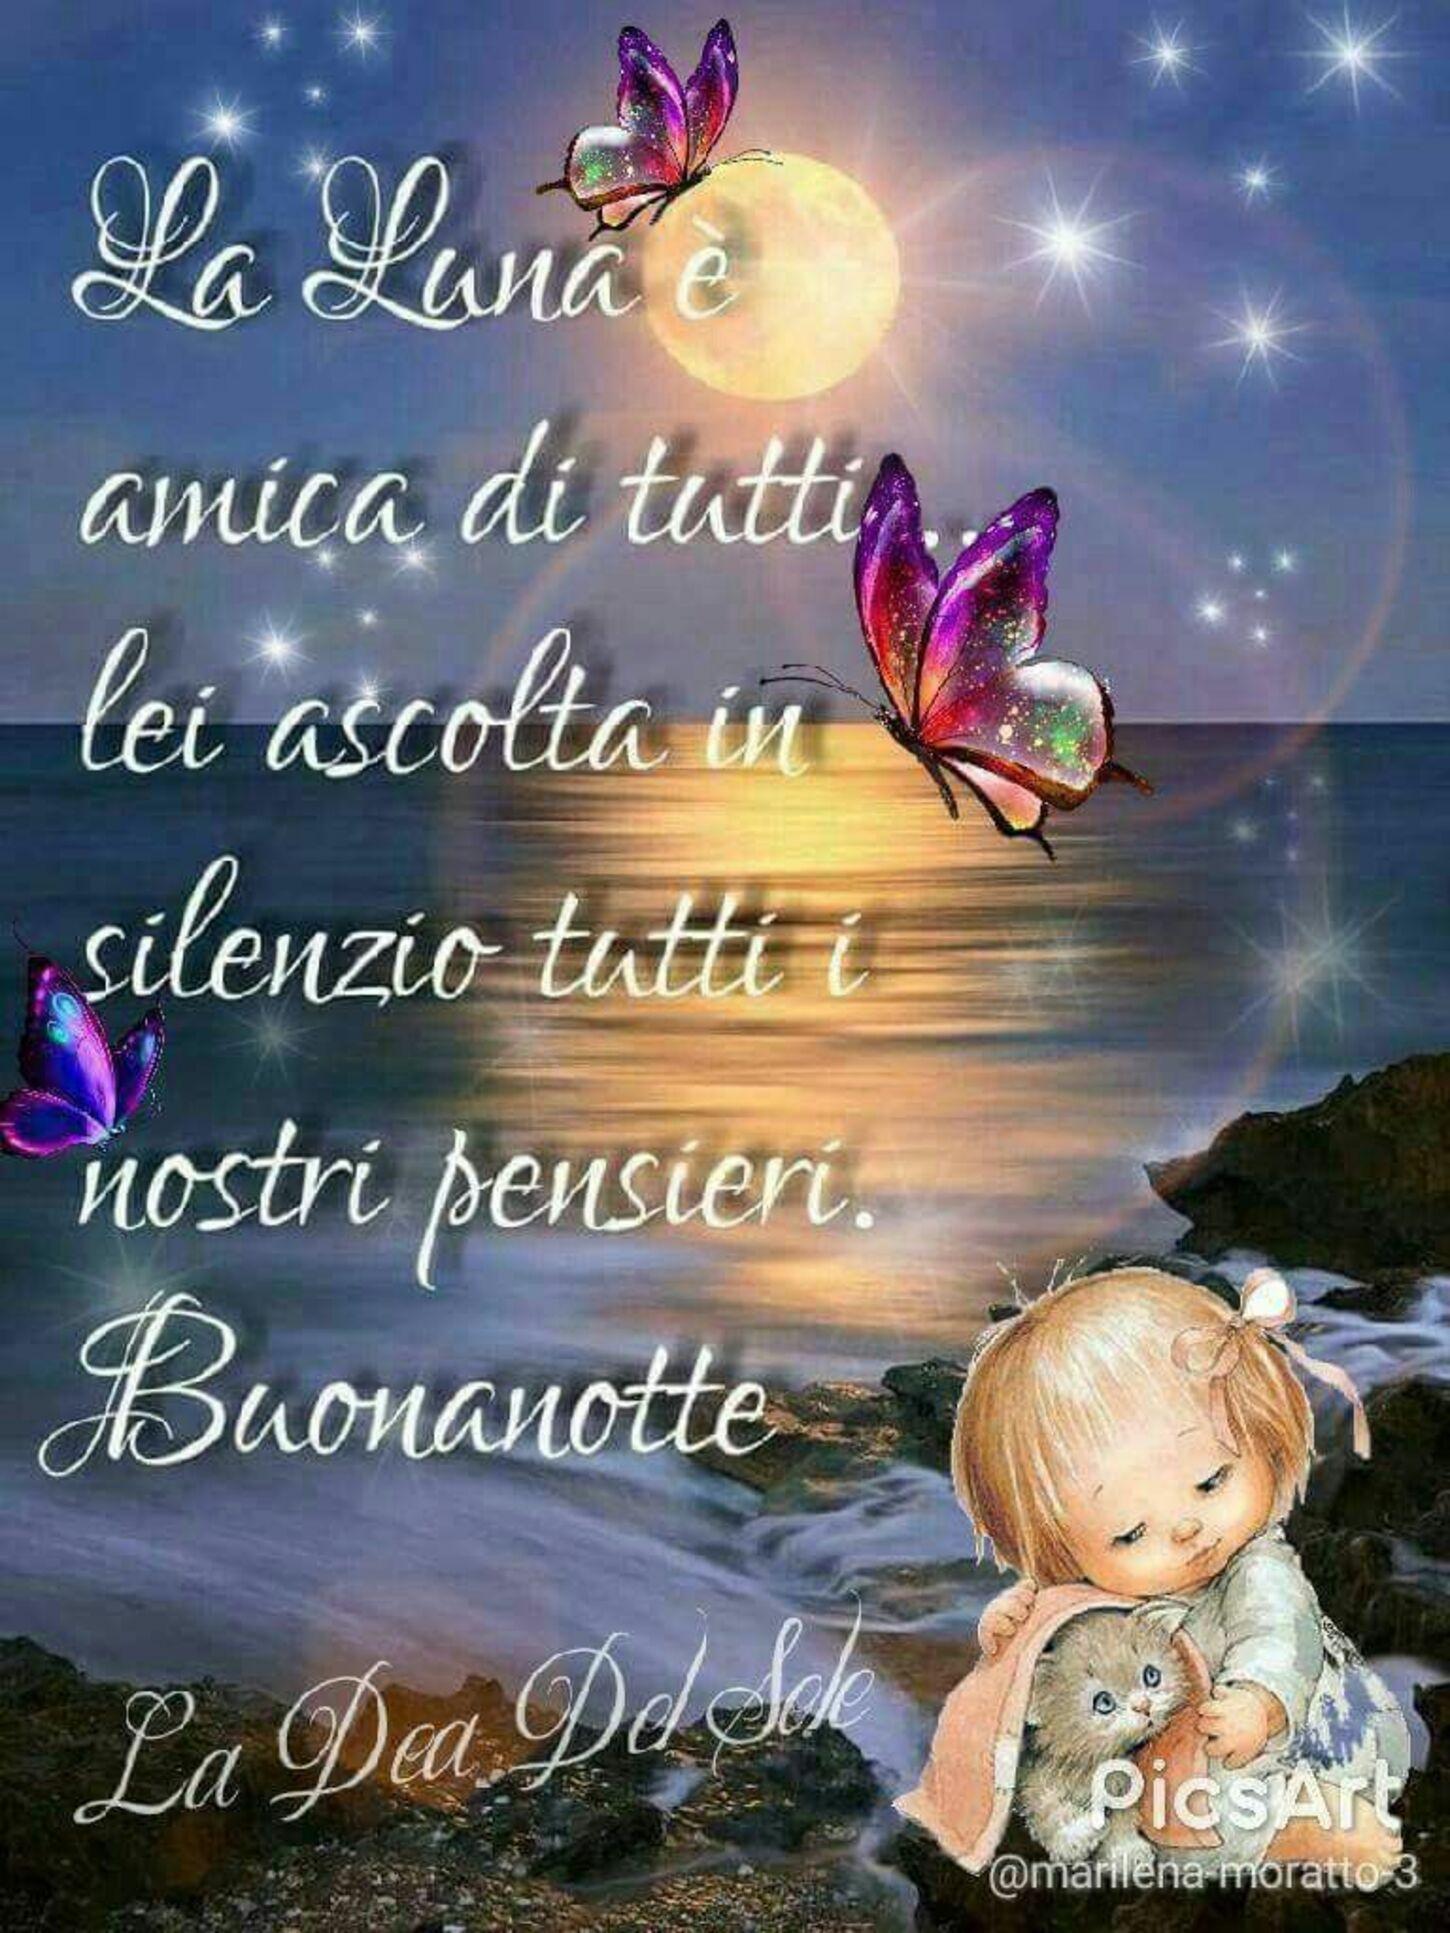 La luna è l'amica di tutti, lei ascolta in silenzio tutti i nostri pensieri. Buonanotte